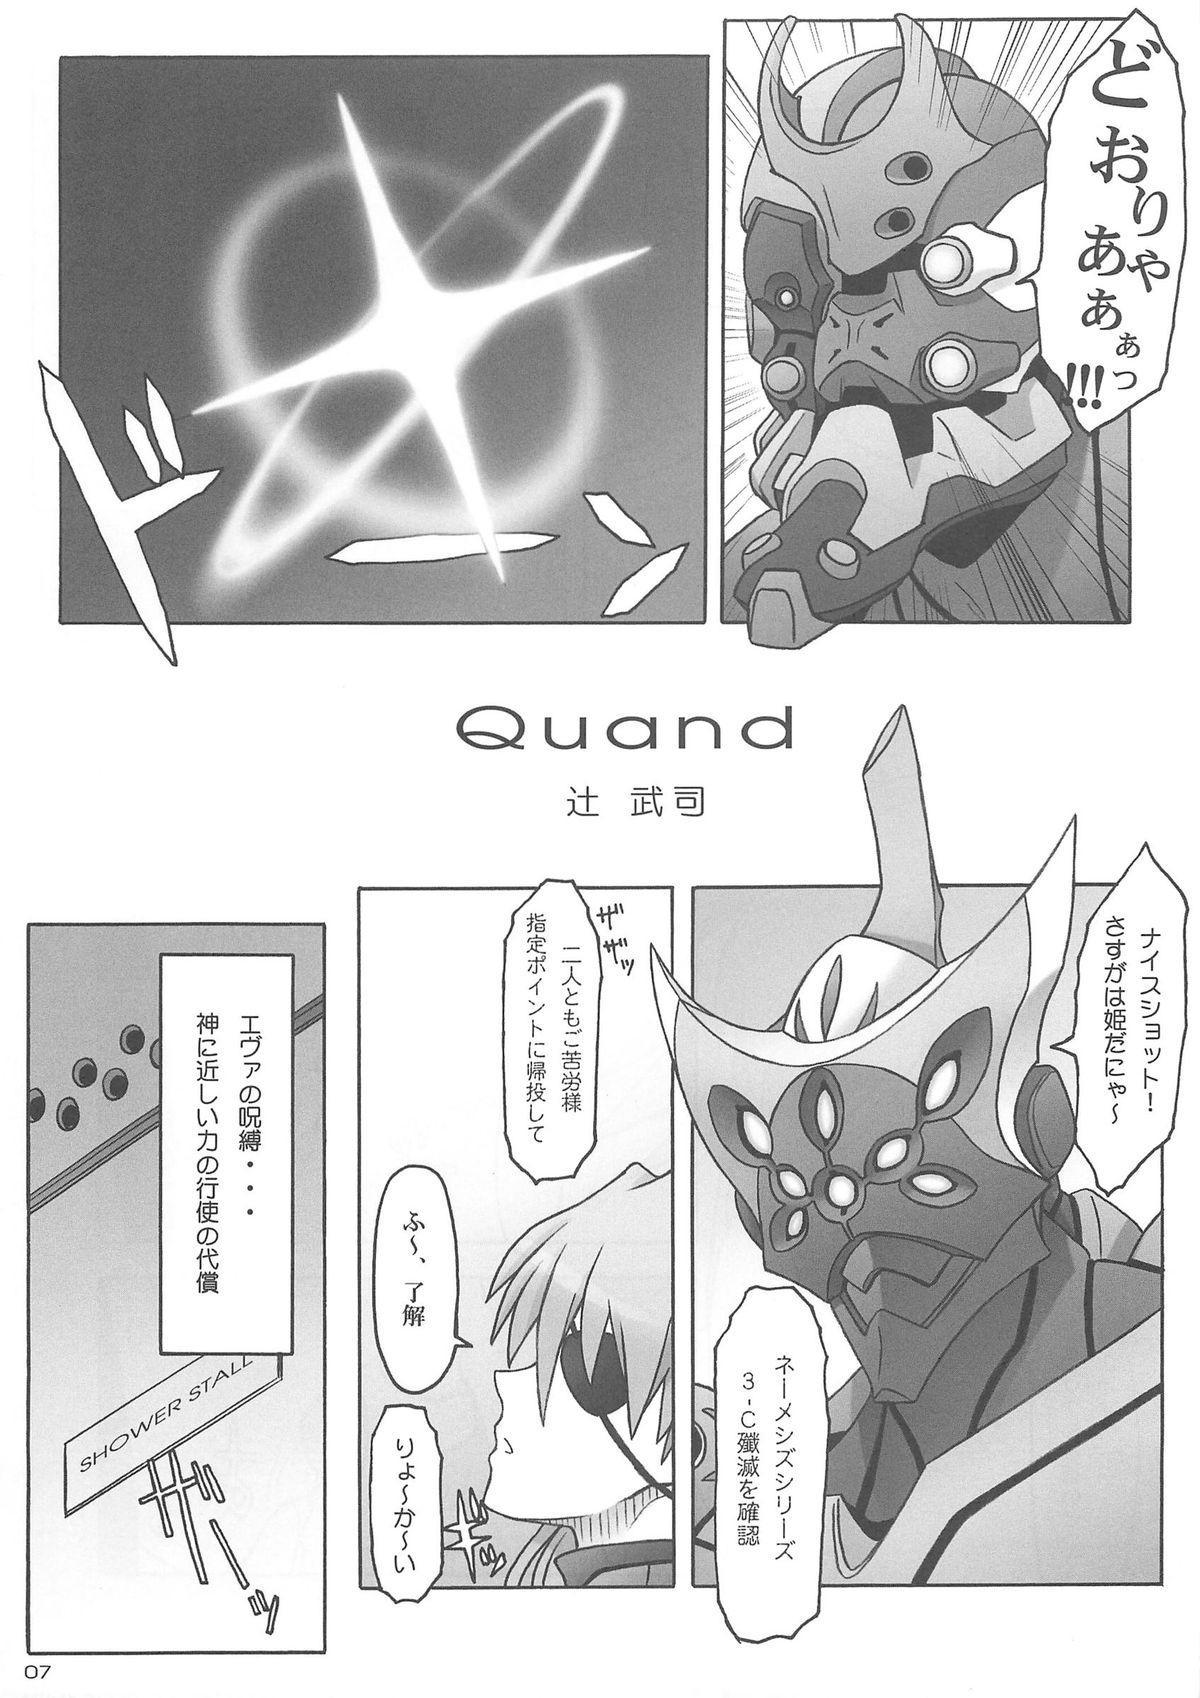 Quickening 4